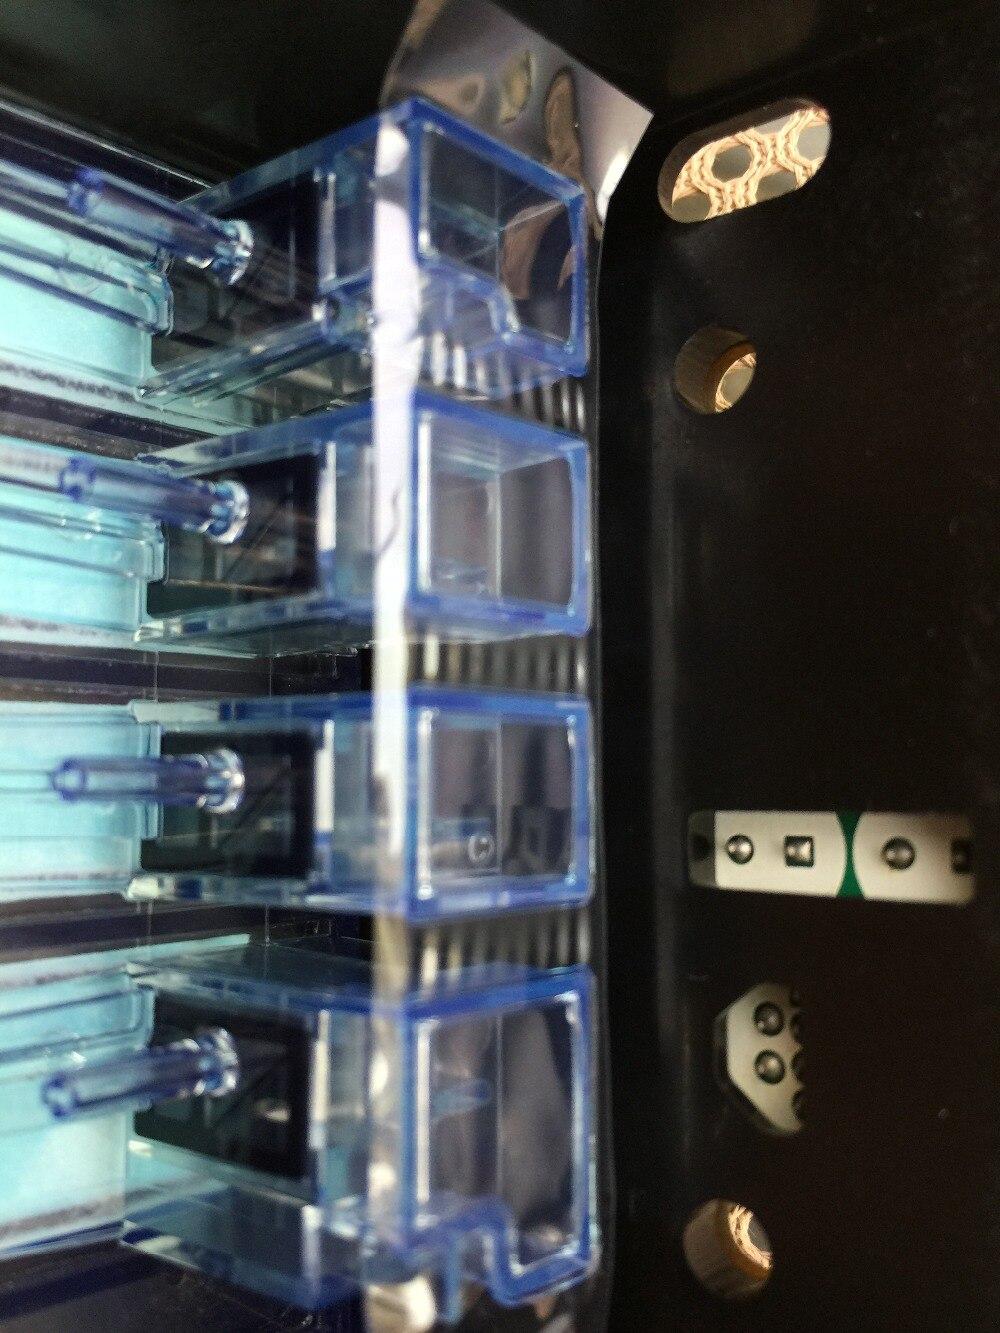 100PCS Brand NEW  PRINTHEAD Genuine OEM Print Head For HP 932 933 for HP 6100 6600 6700 7110 7610 932xl 933xl 932 933 printhead for hp officejet pro 6100 6600 6815 6700 7610 7110 printer head for hp 932 hp933 printhead